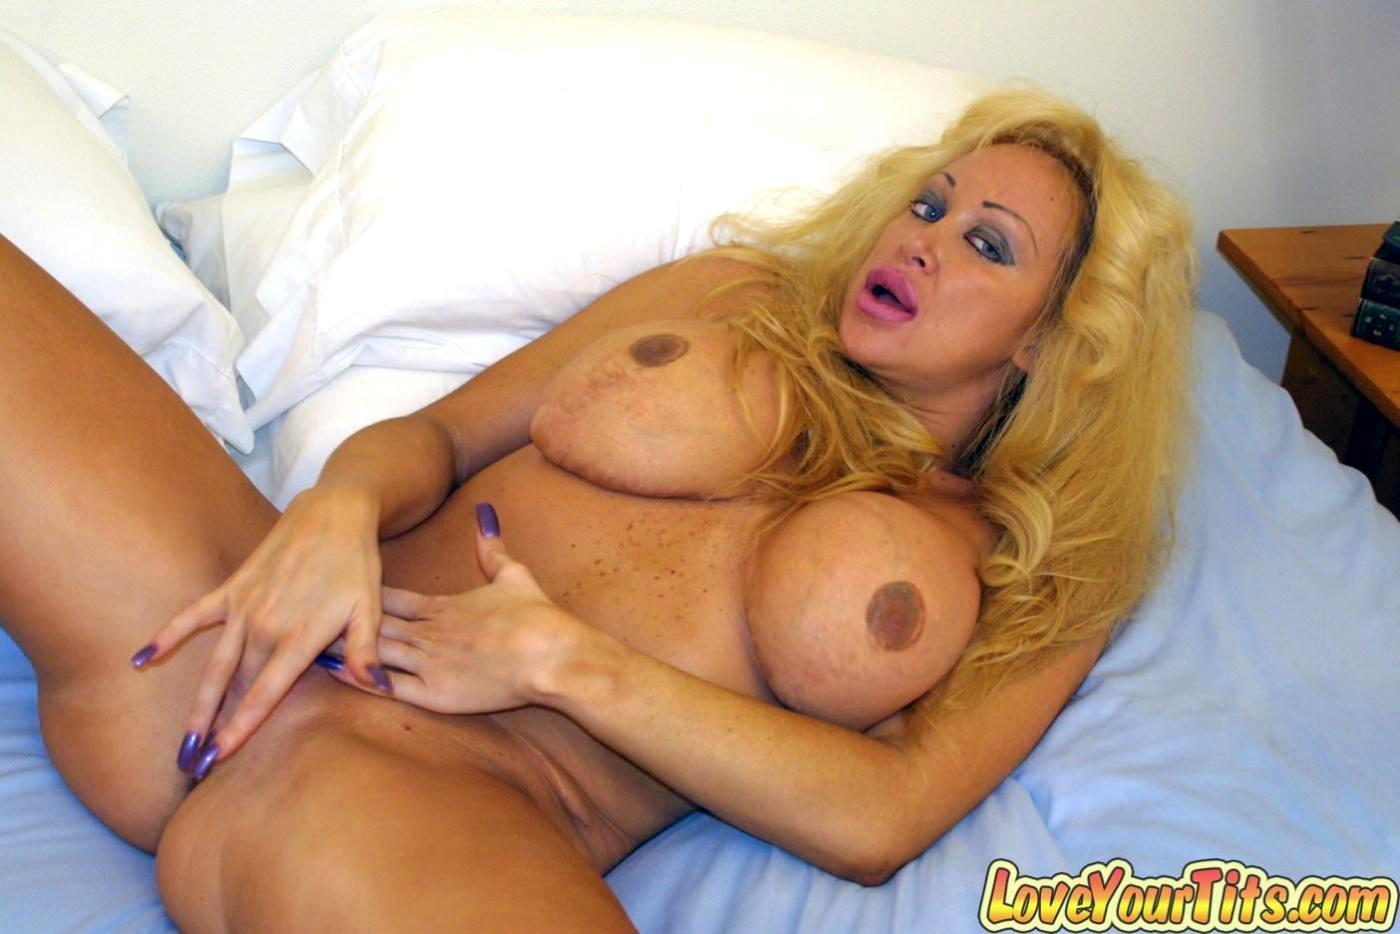 Freaksofboobs pamela peaks pantyjob big tits nude free pornpics sexphotos xxximages hd gallery